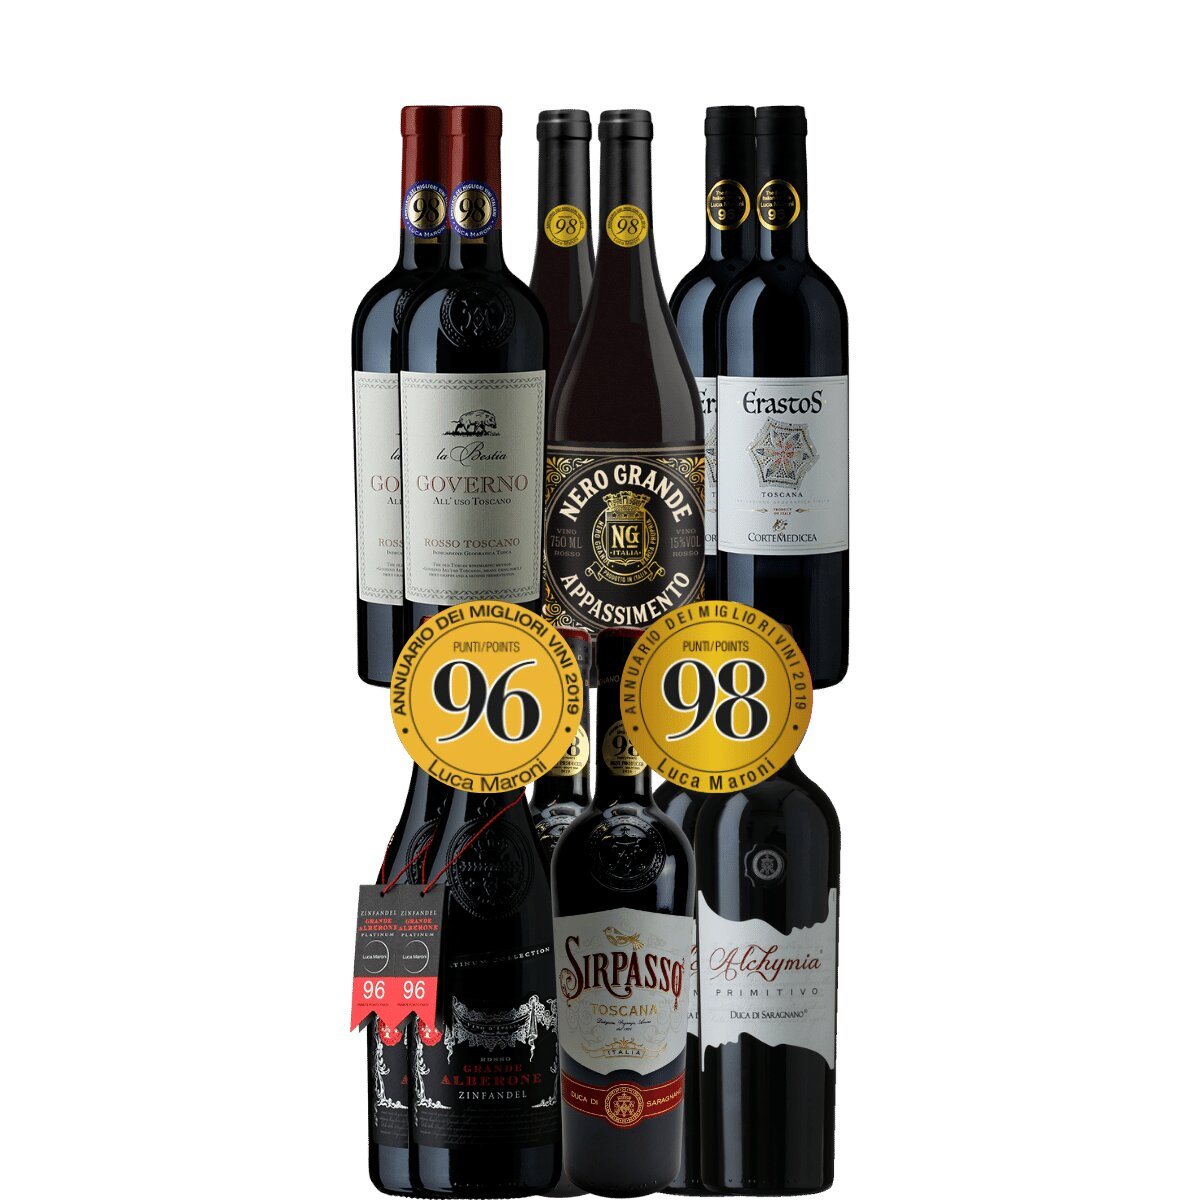 Bestseller-Paket Rotwein Italien (6x2 Fl.) -  - , , , ,